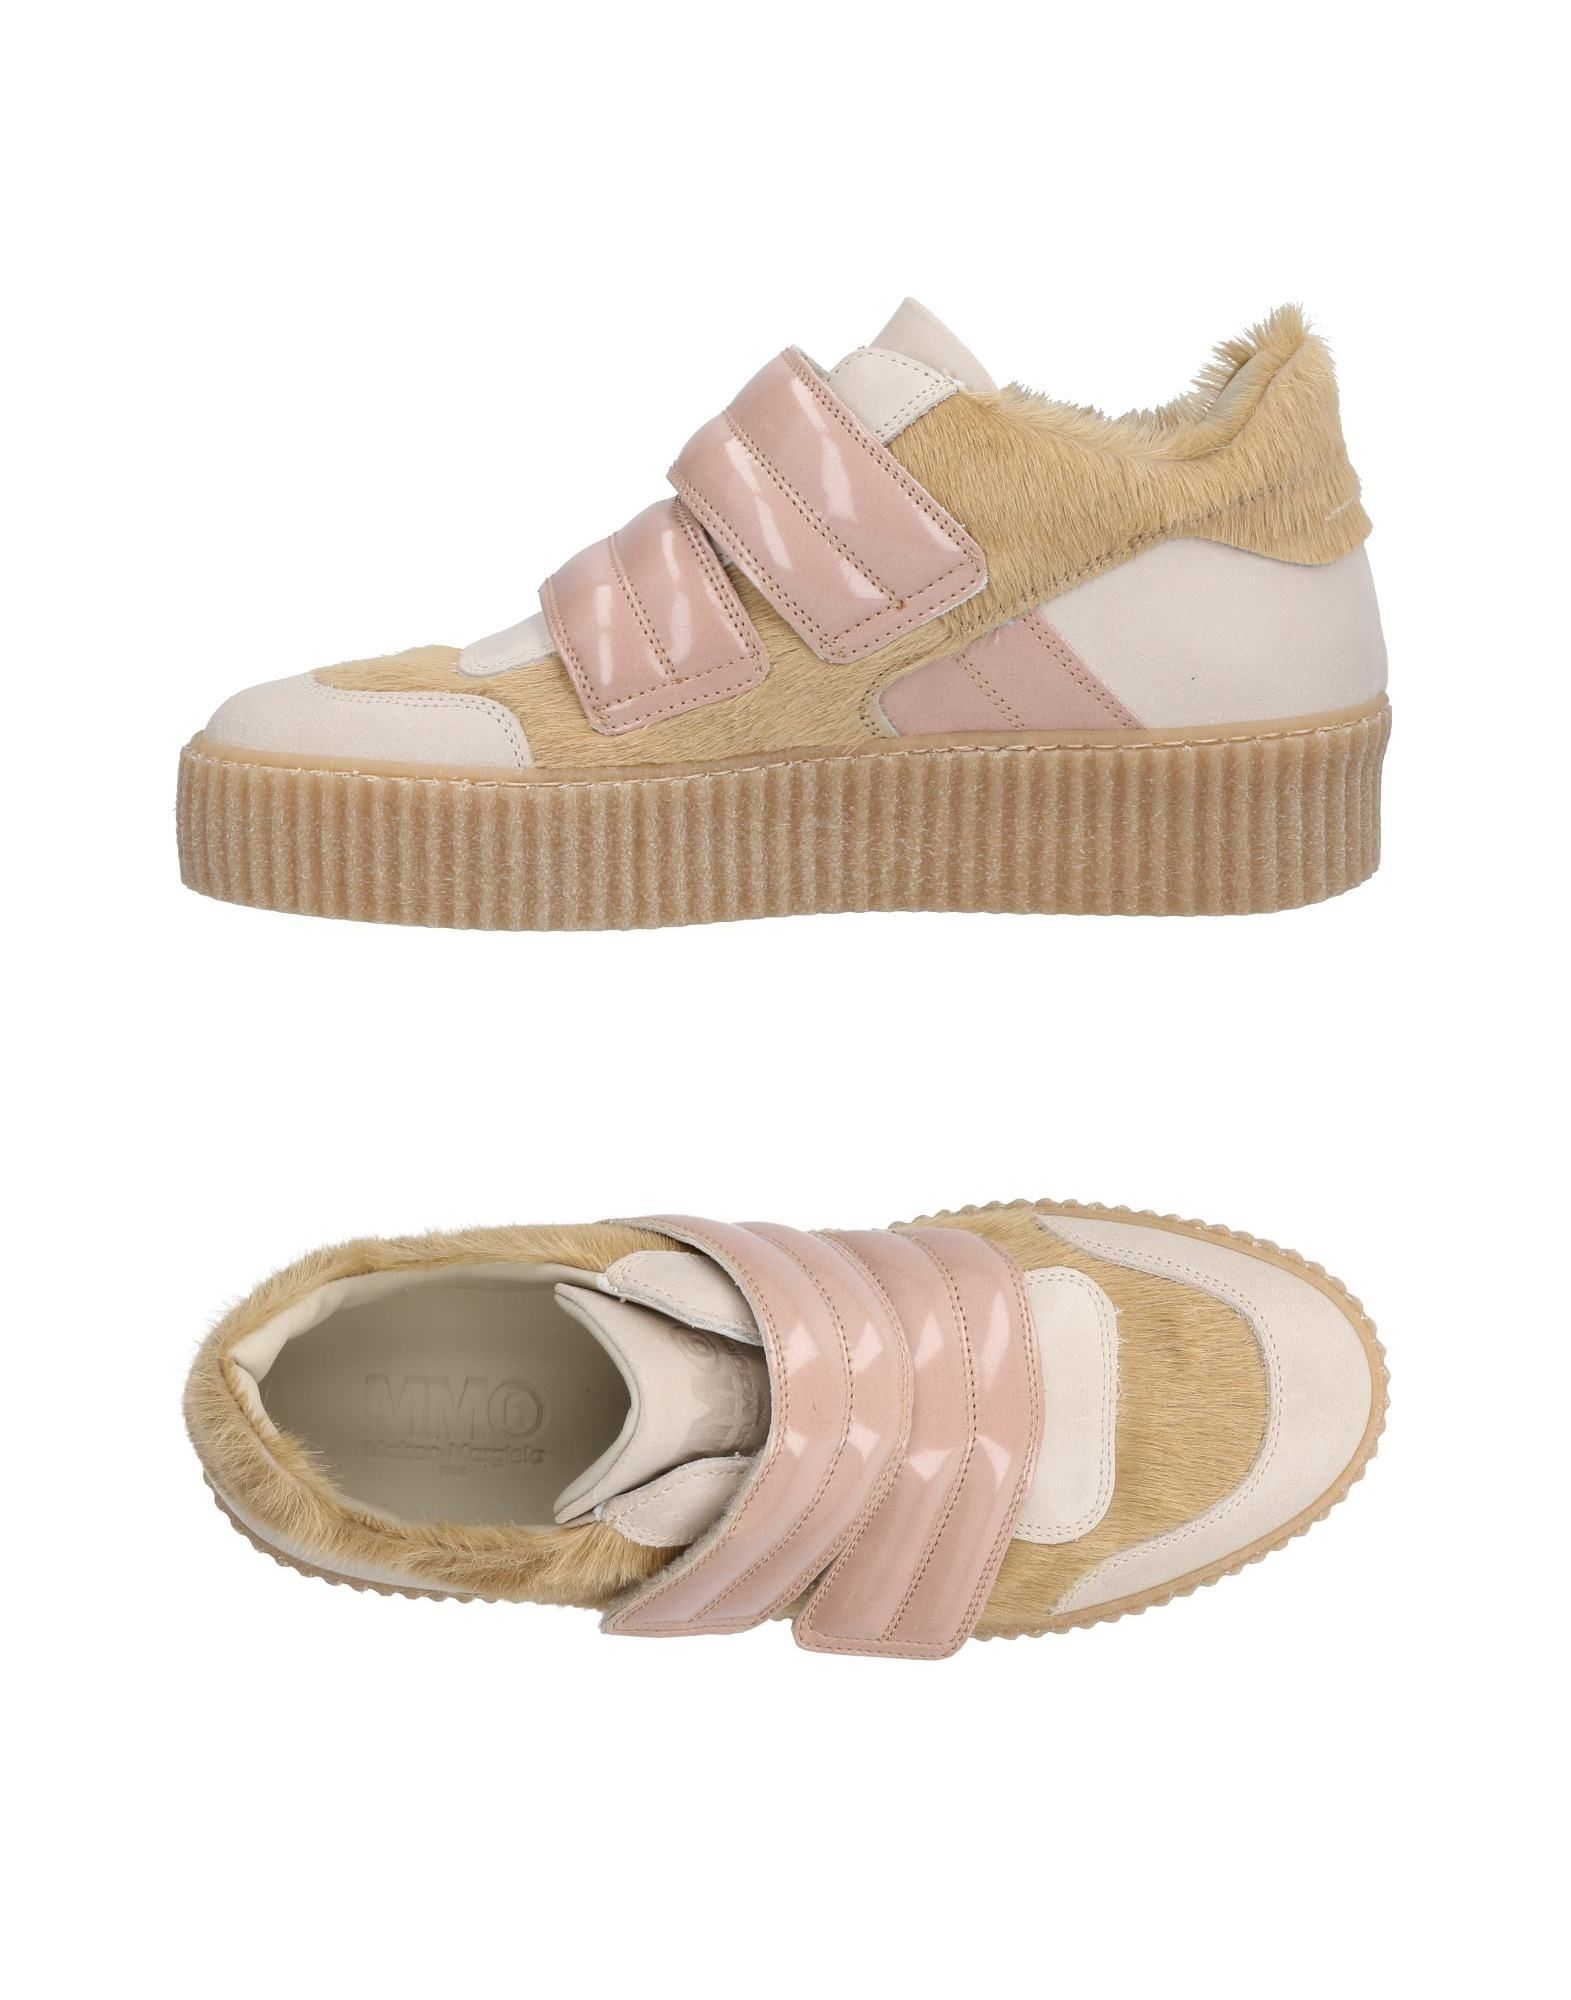 Mm6 Maison Margiela Sneakers Damen  11467116IAGut aussehende strapazierfähige Schuhe